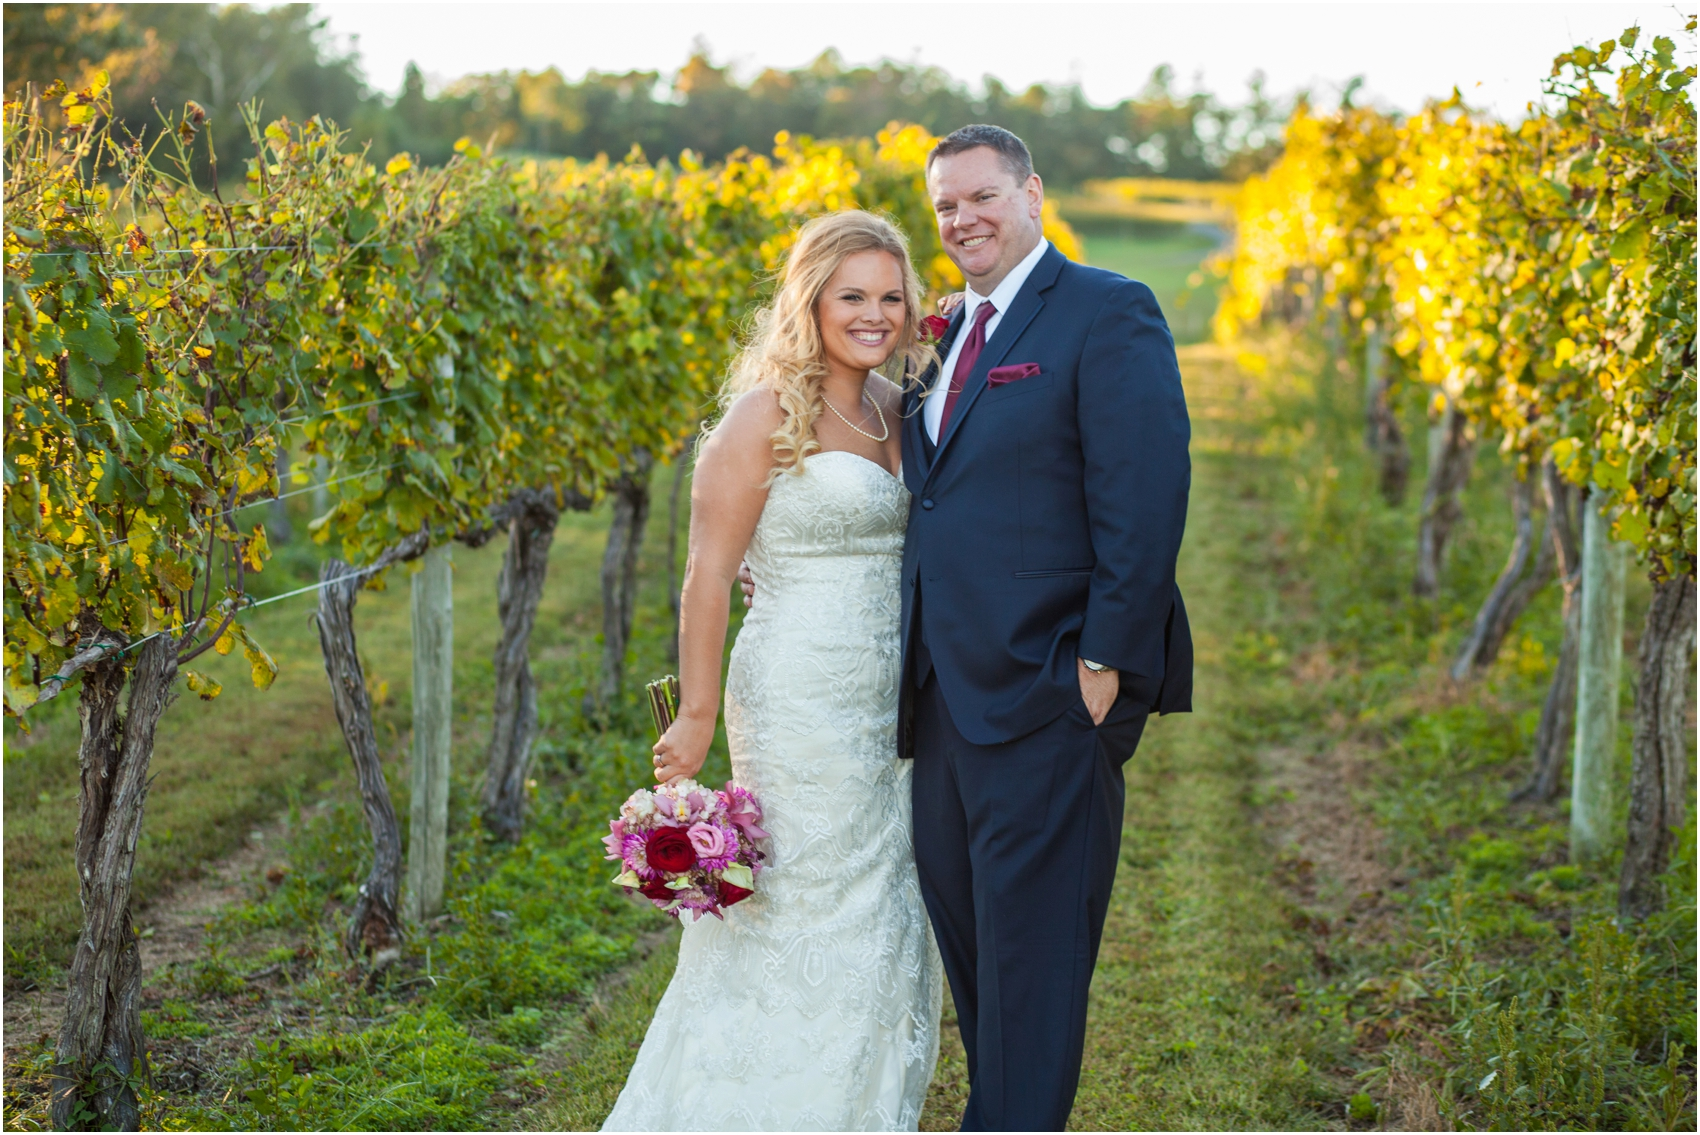 Grace-Estate-Winery-Fall-Virginia-Wedding-6945.jpg